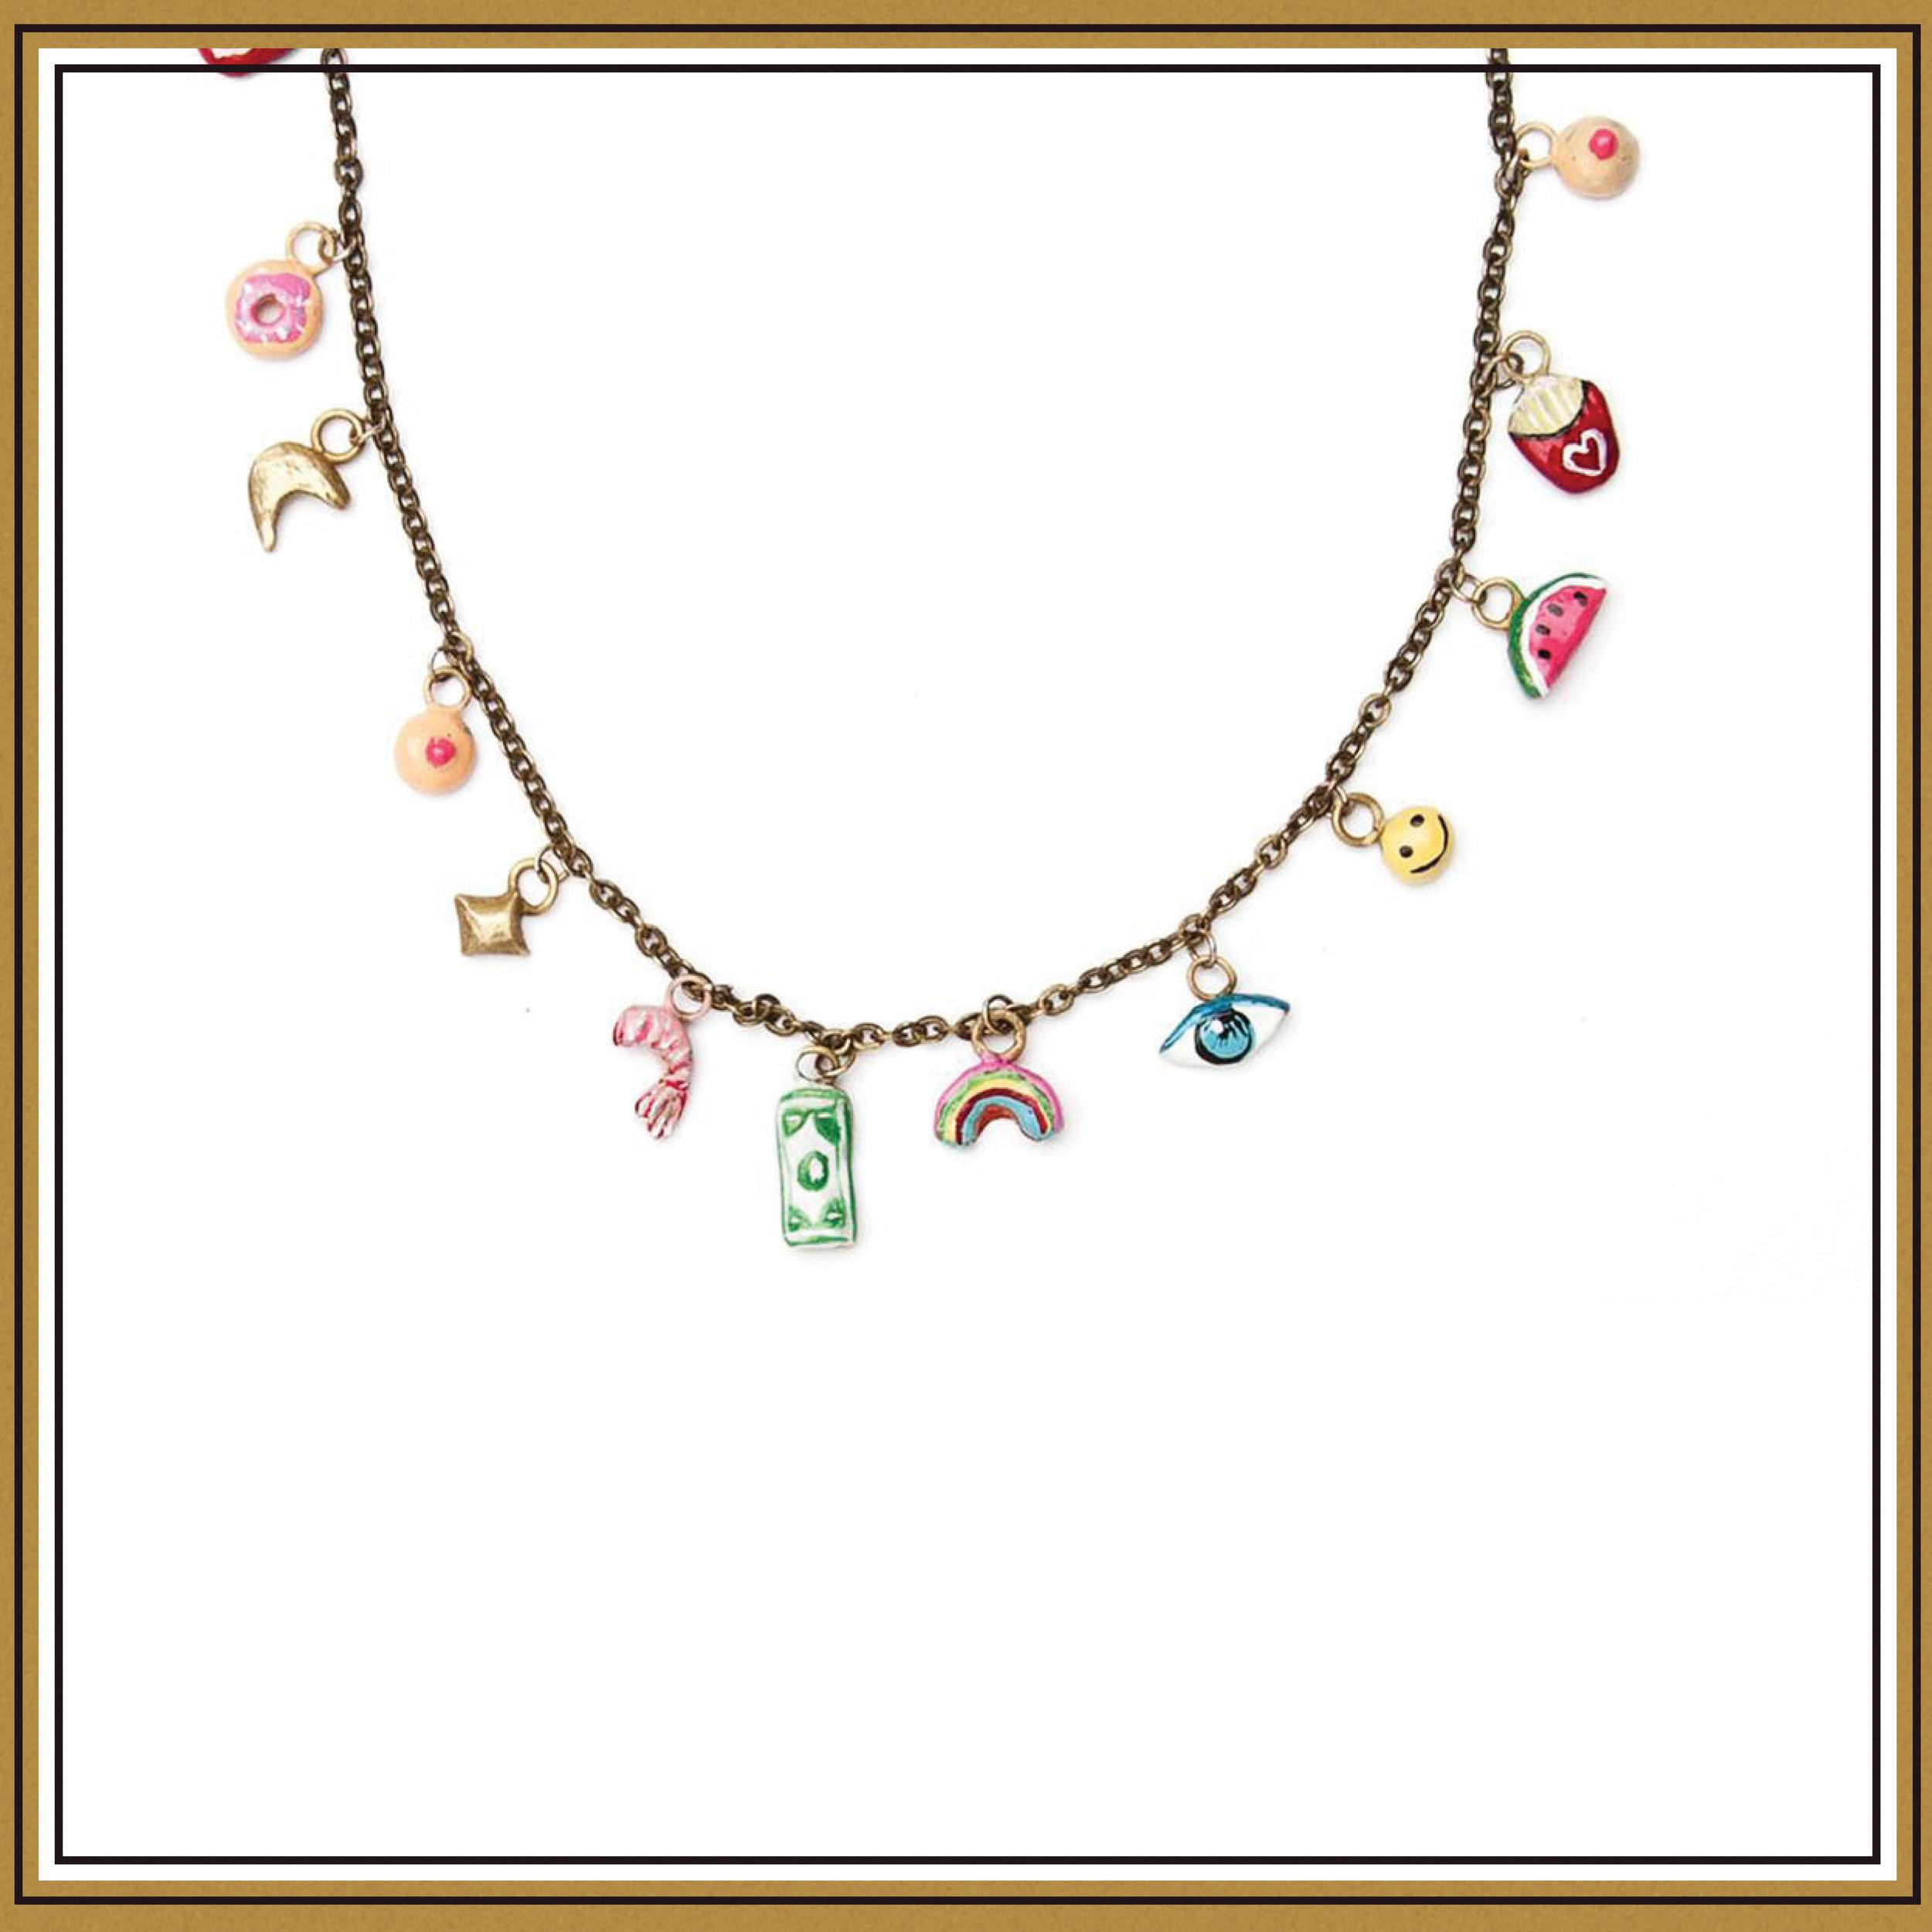 Susan Alexandra Tiny Joys Necklace ($138)